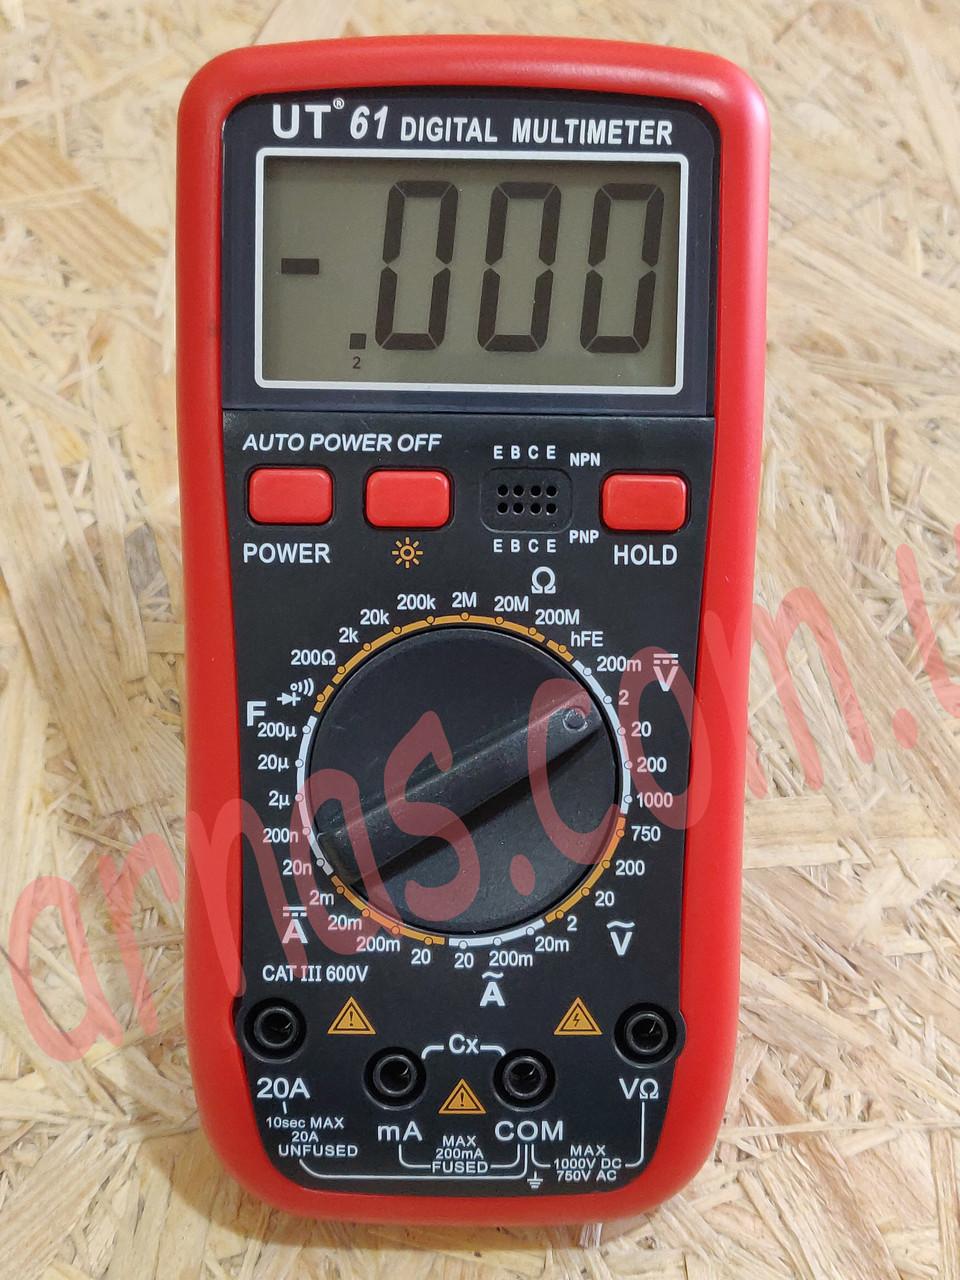 Мультиметр (тестер) Digital Multimeter UT(VC)61 цифровой, фото 1